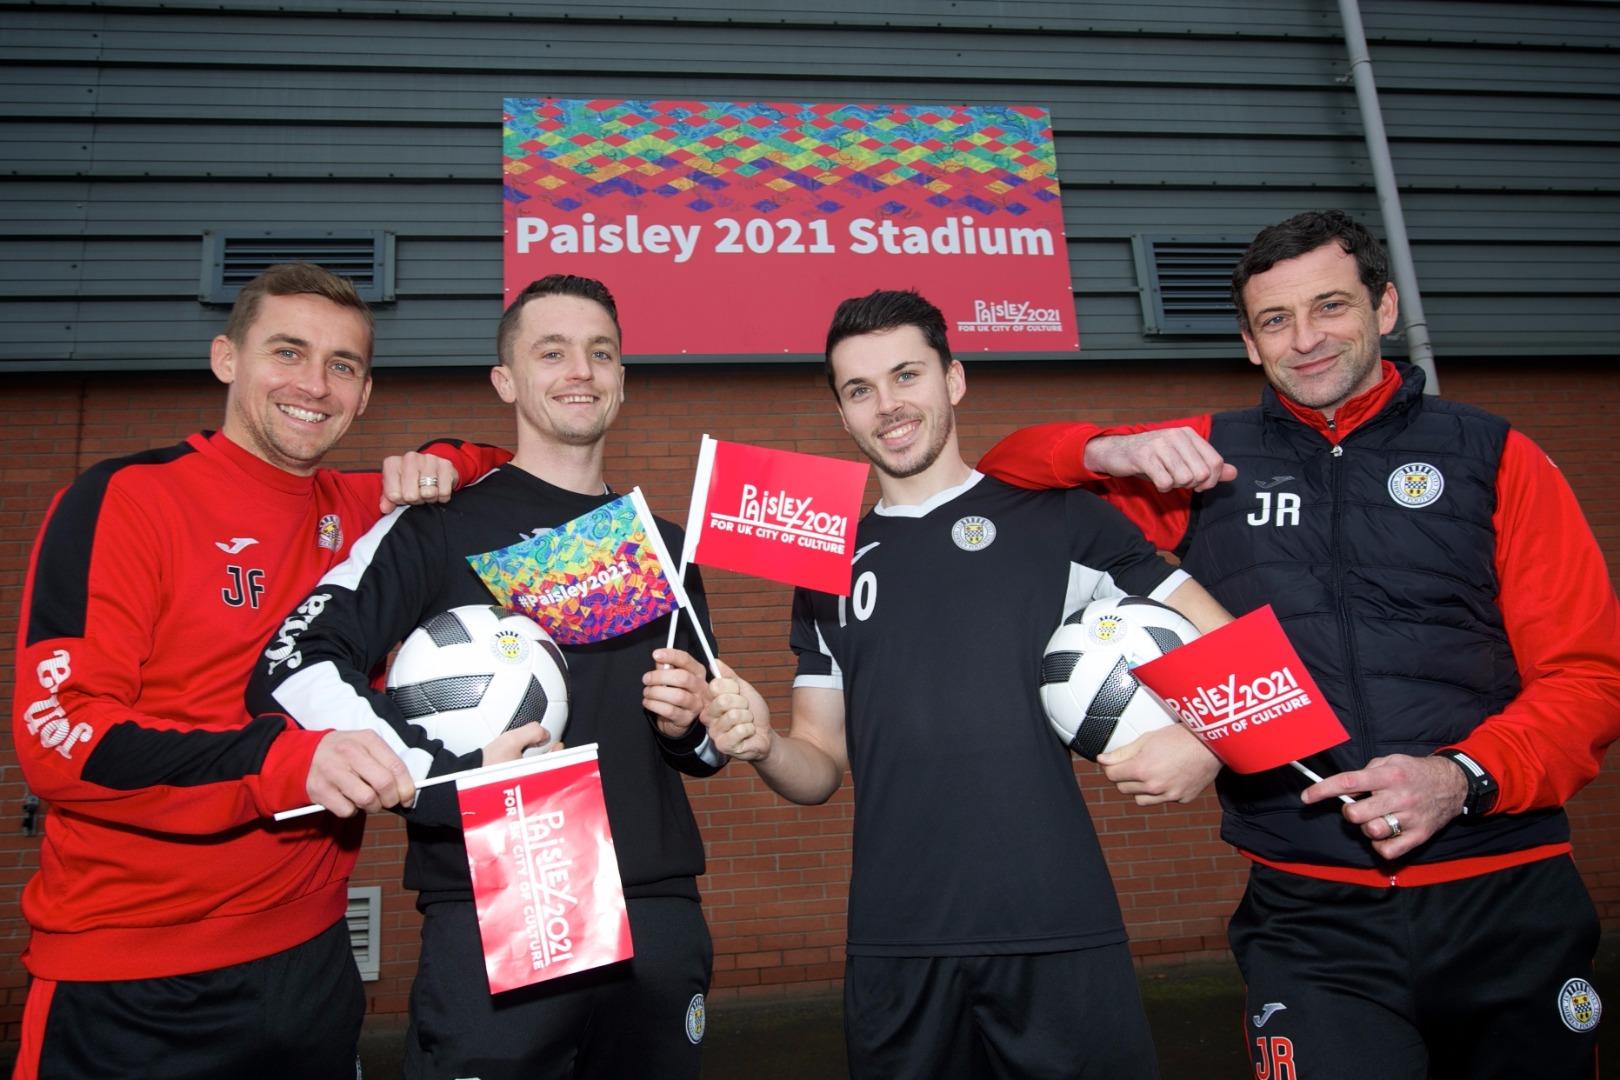 St Mirren & Paisley 2021 Stadium (3).jpg (1)